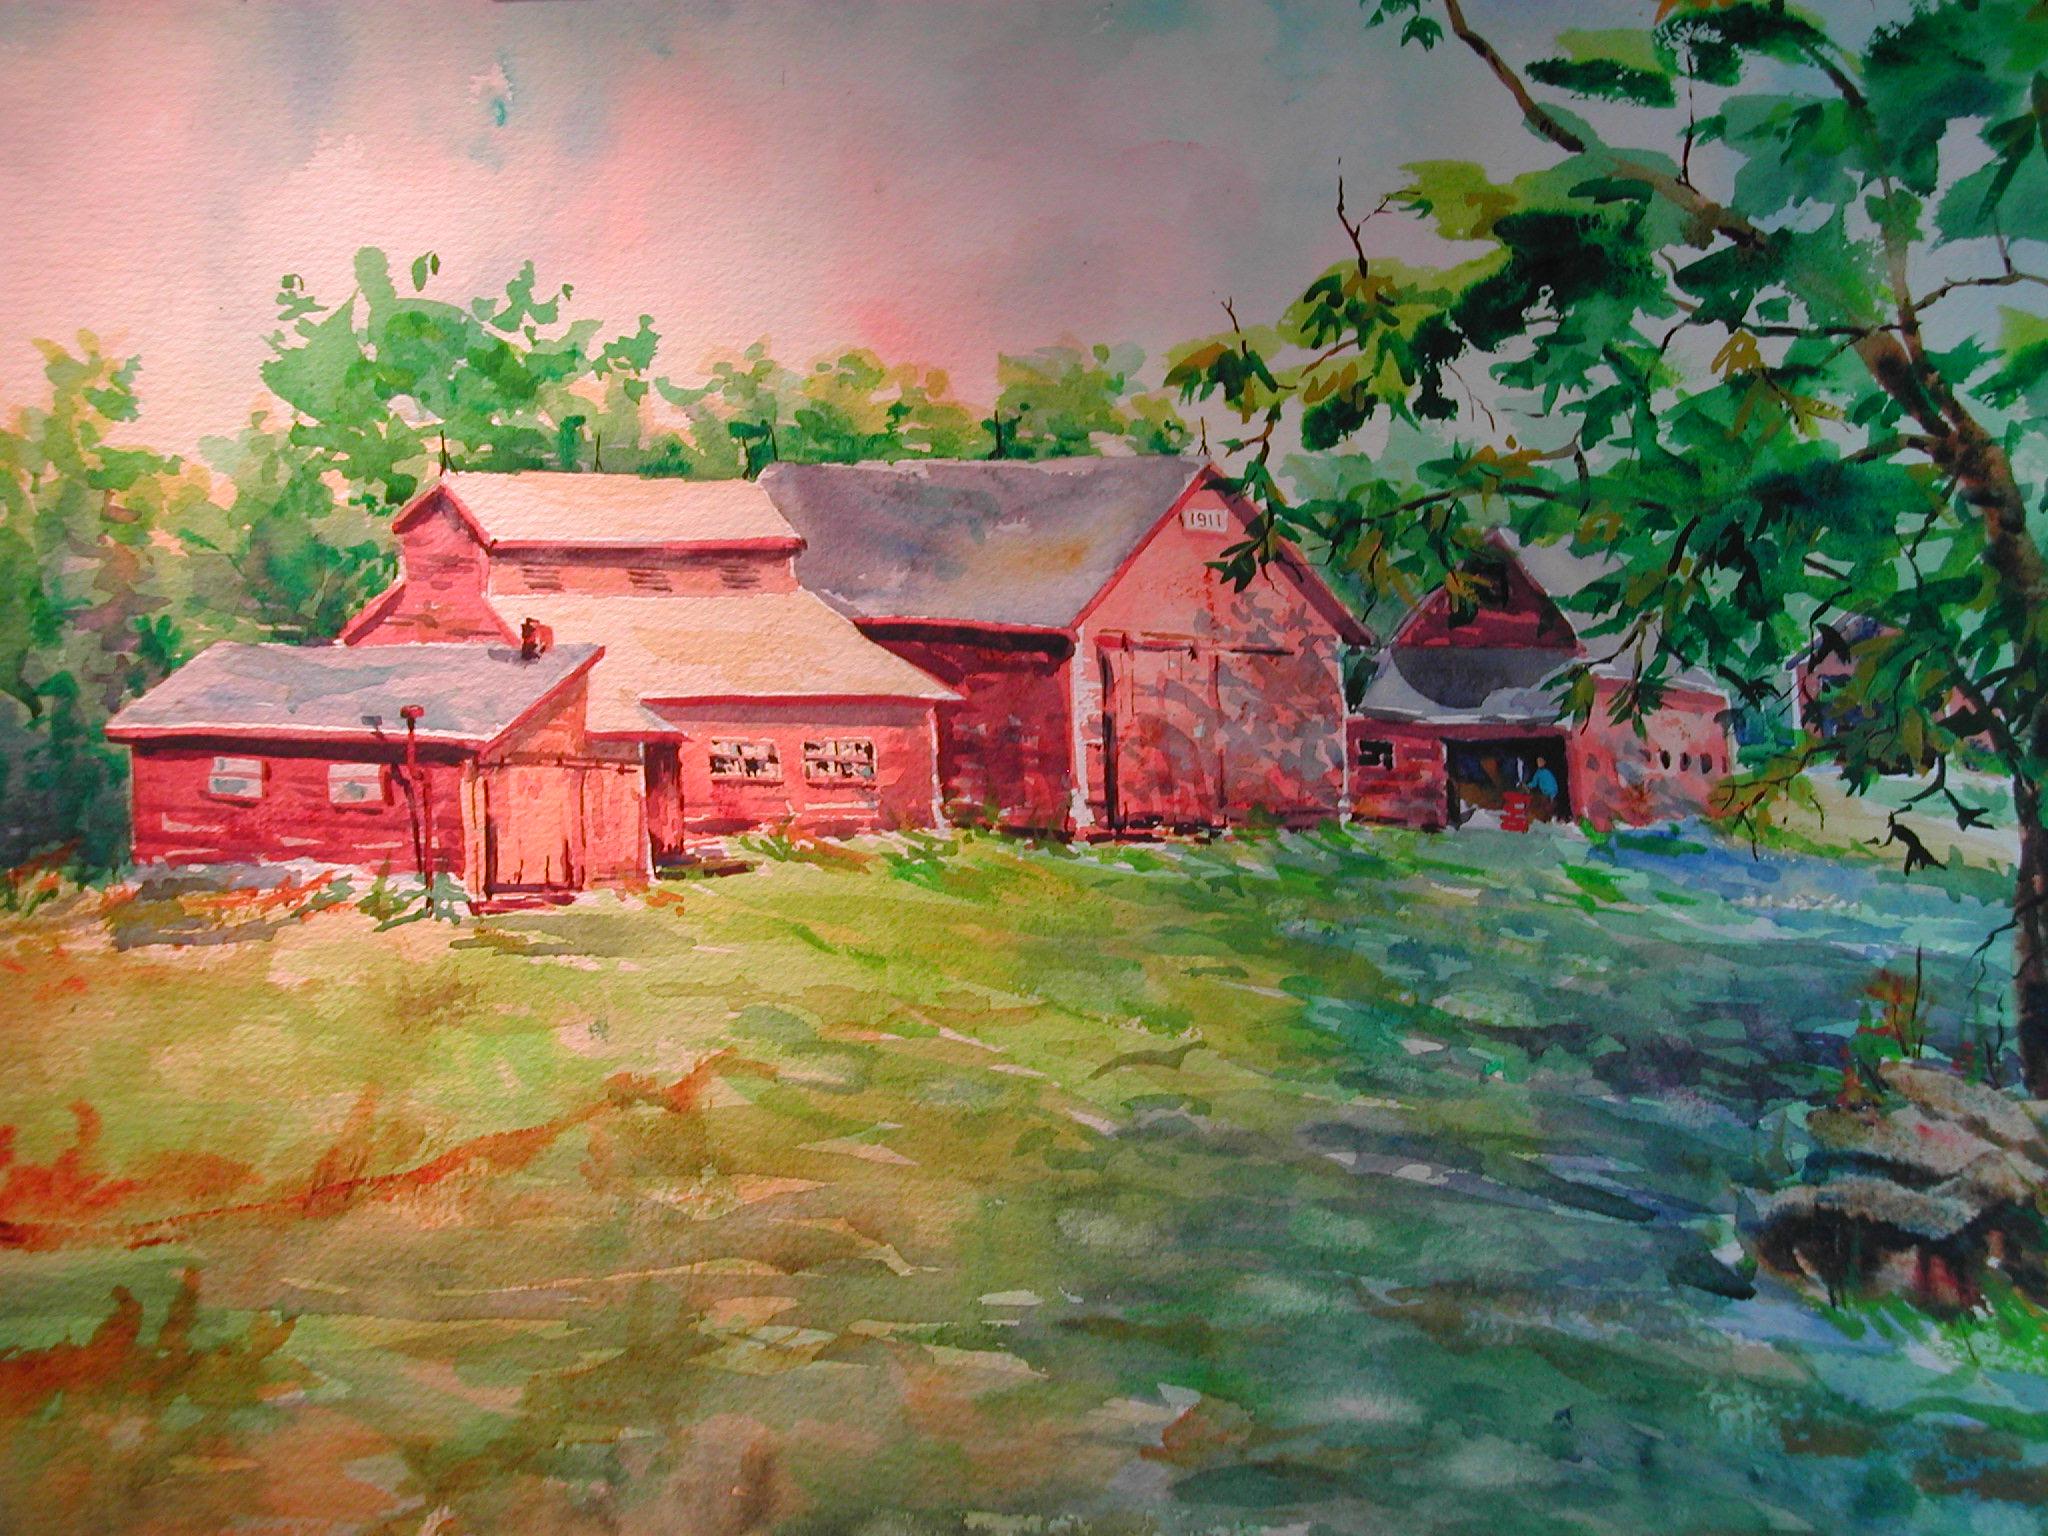 Lotta Rock Barns, watercolor, 15 x 22